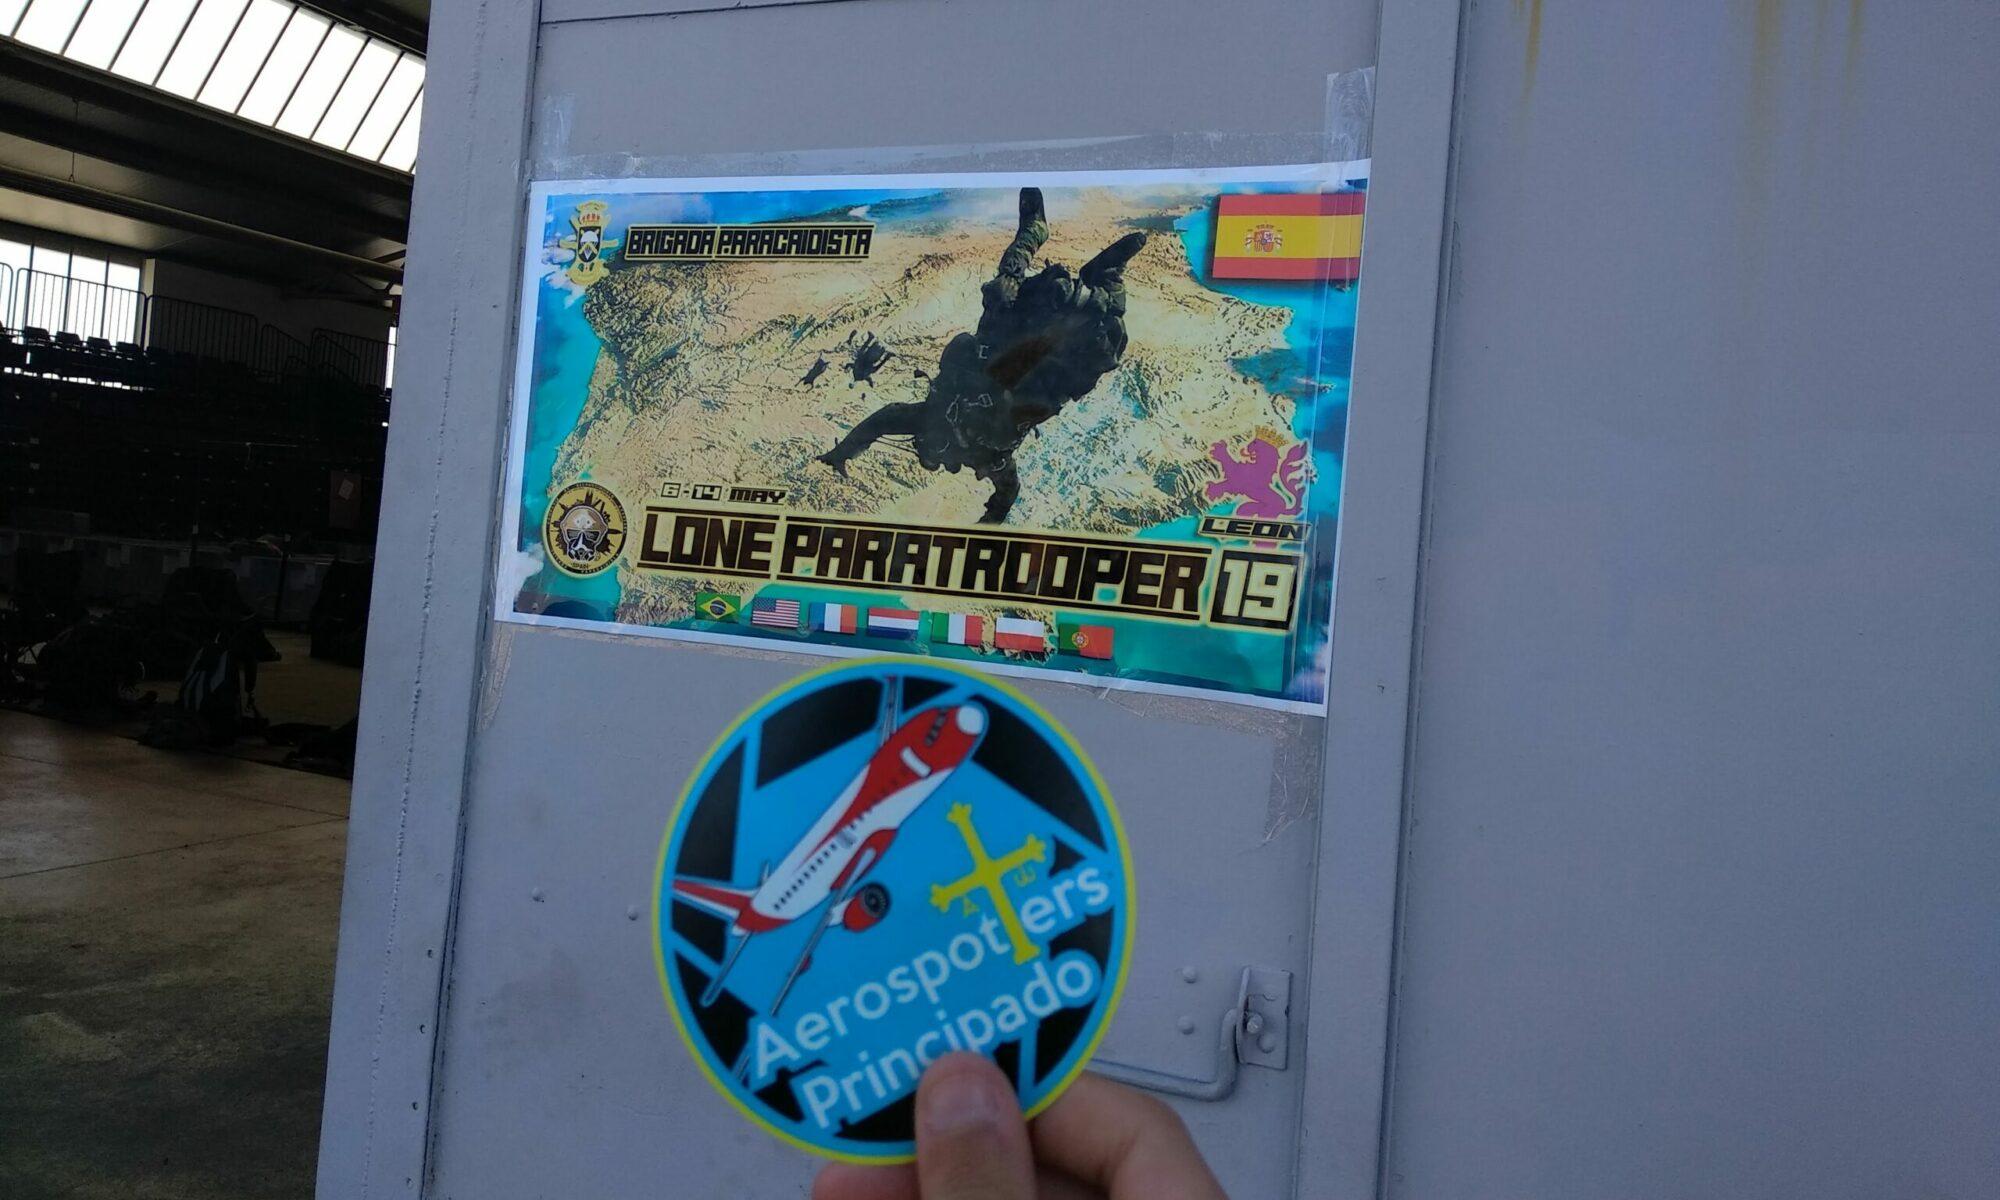 AeroSpotters Principado